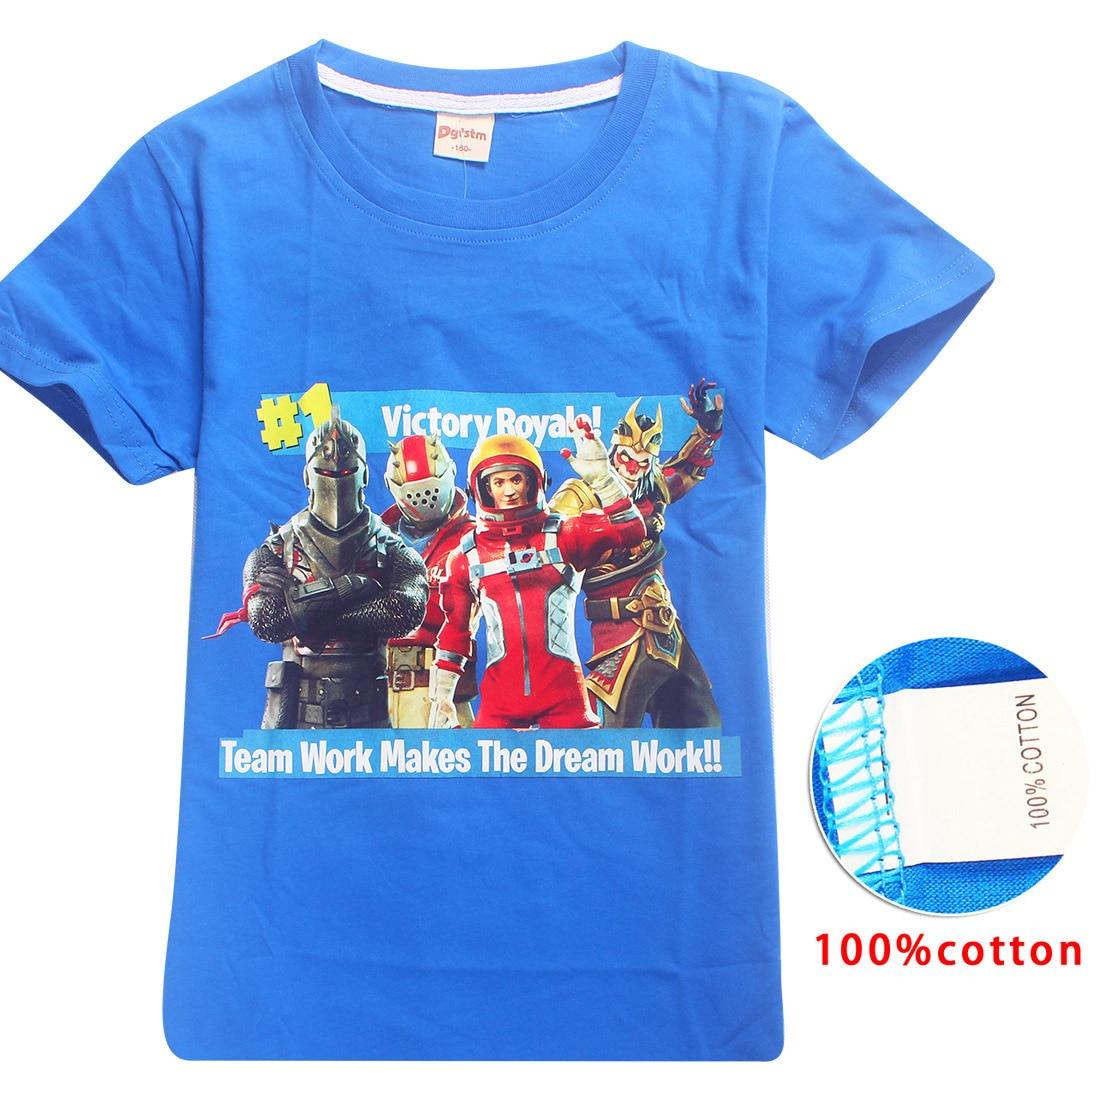 Game Fortnite Battle Royale Kids Tops Summer Short Sleeve T Shirt Girls T-shirts Big Boys Casual Sports Tees Cartoon Clothing